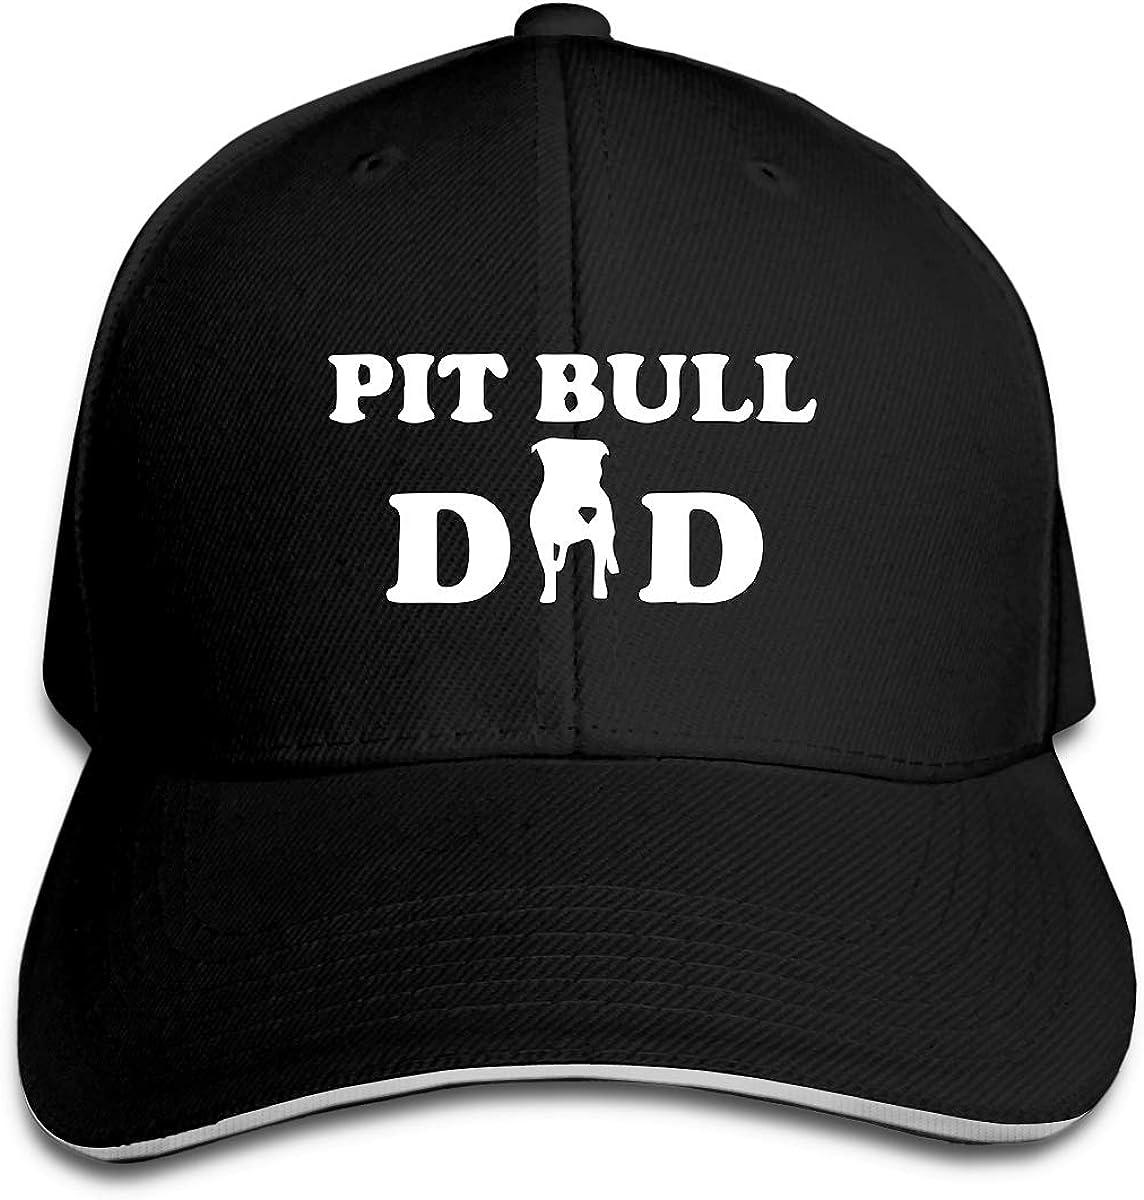 Pitbull Dad Outdoor Snapback Sandwich Cap Adjustable Baseball Hat Street Rapper Hat